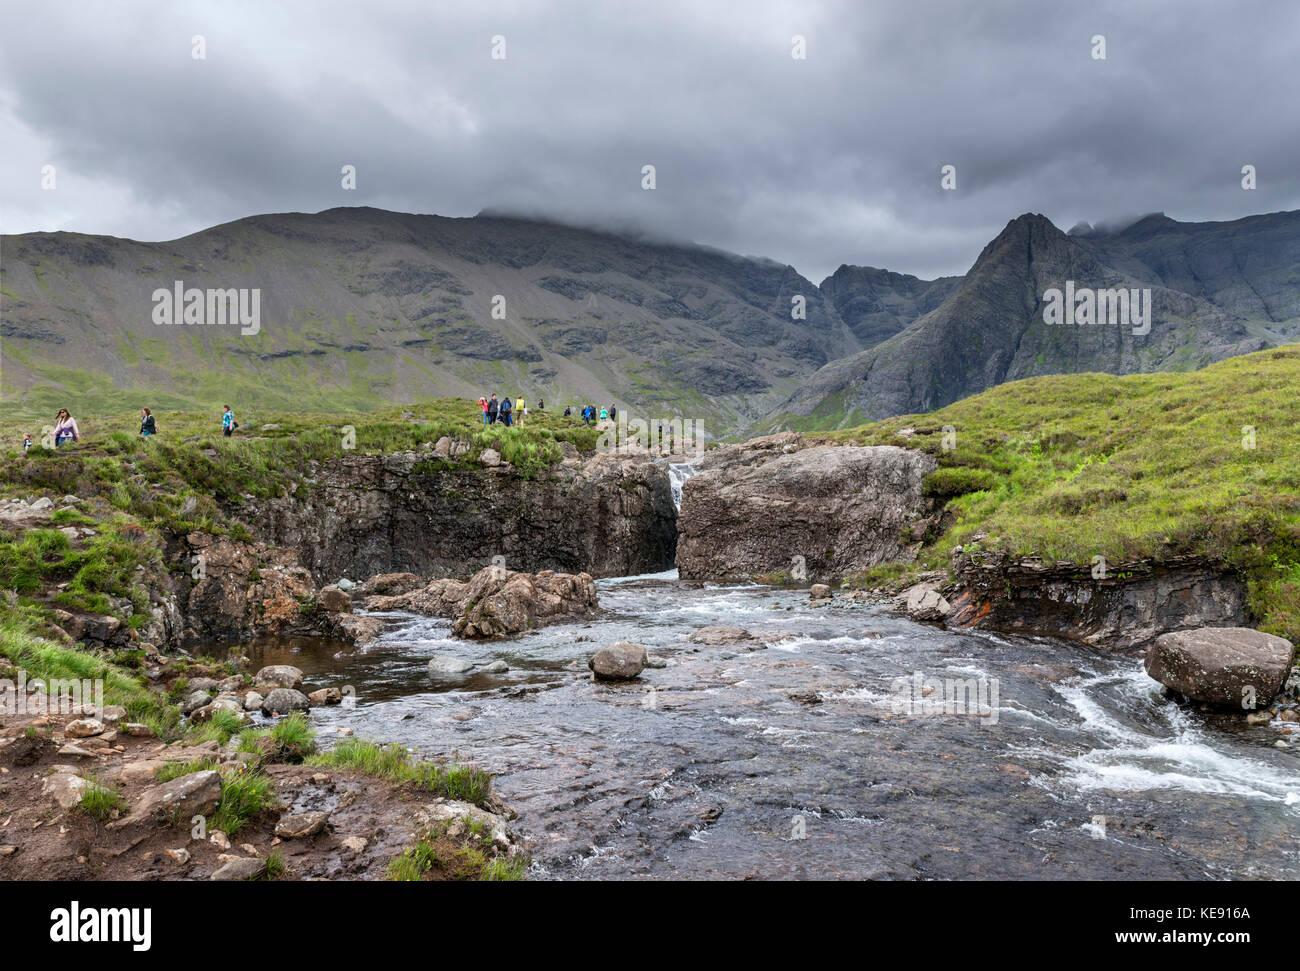 Walkers at the Fairy Pools, Glen Brittle, Isle of Skye, Highland, Scotland, UK - Stock Image